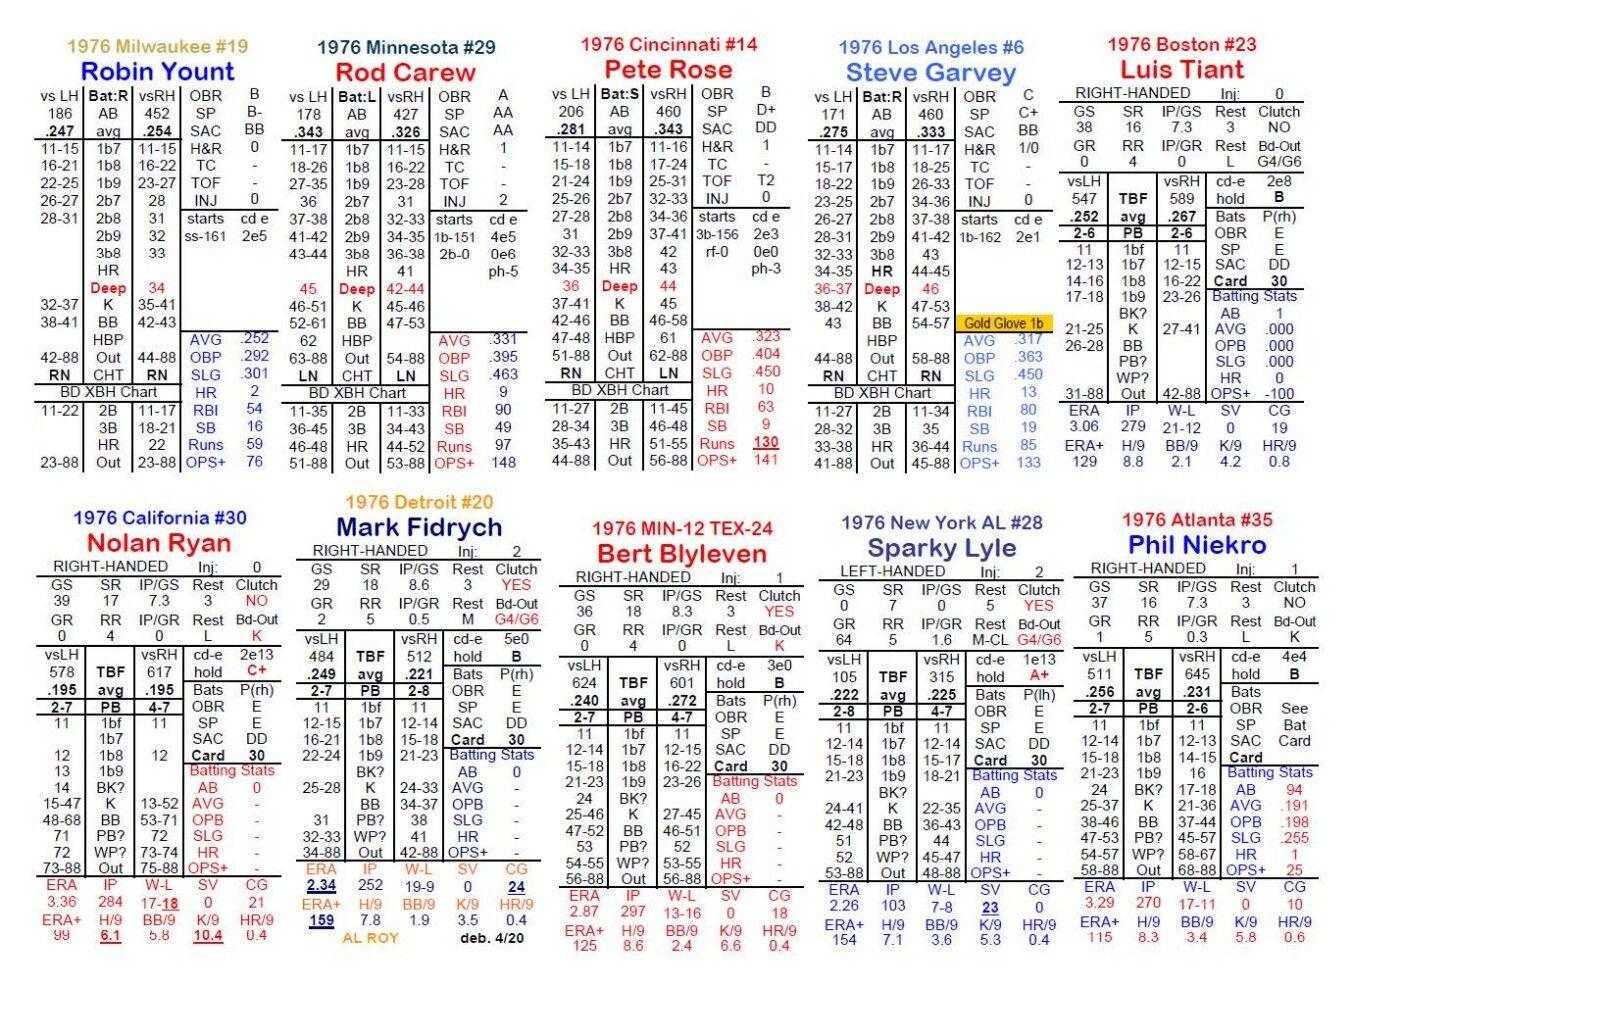 1976 Statis Pro Baseball Advanced Printed Cards